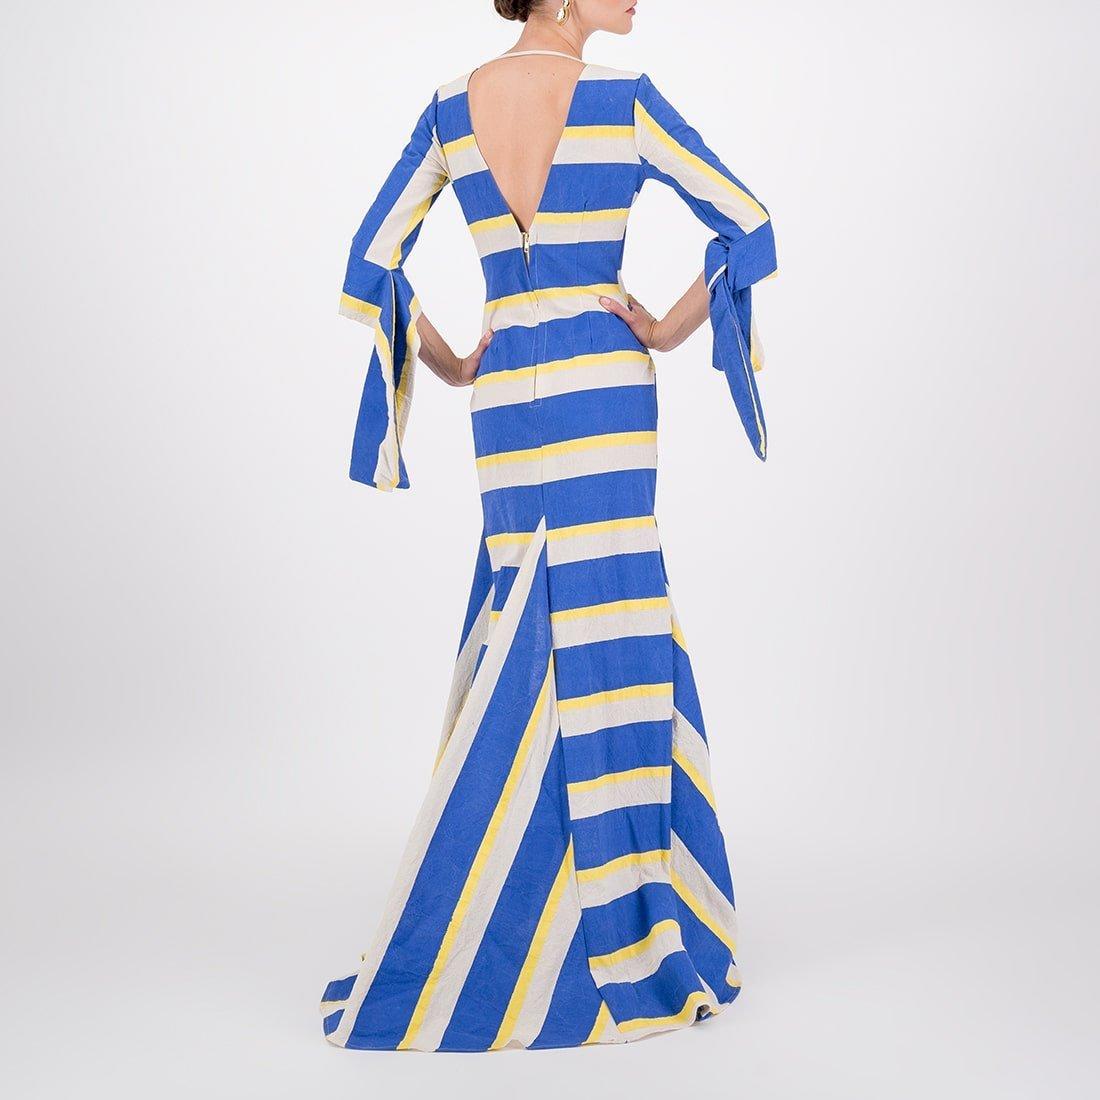 100% cotton floor-length, v-neck gown 3